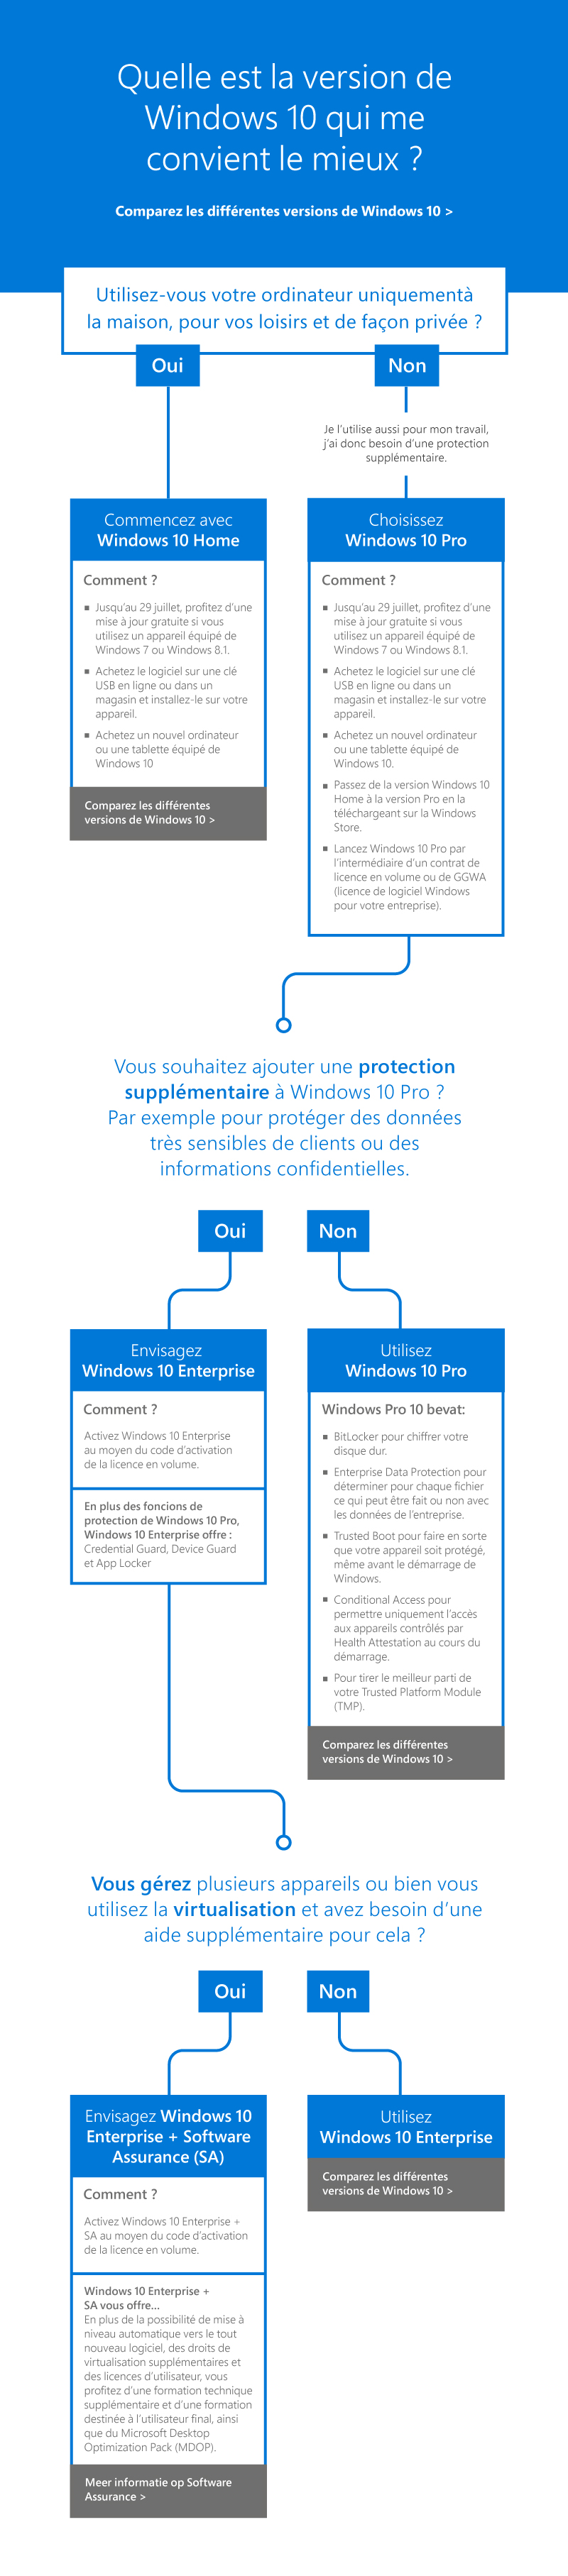 Microsoft_Beslis_Boom_FR